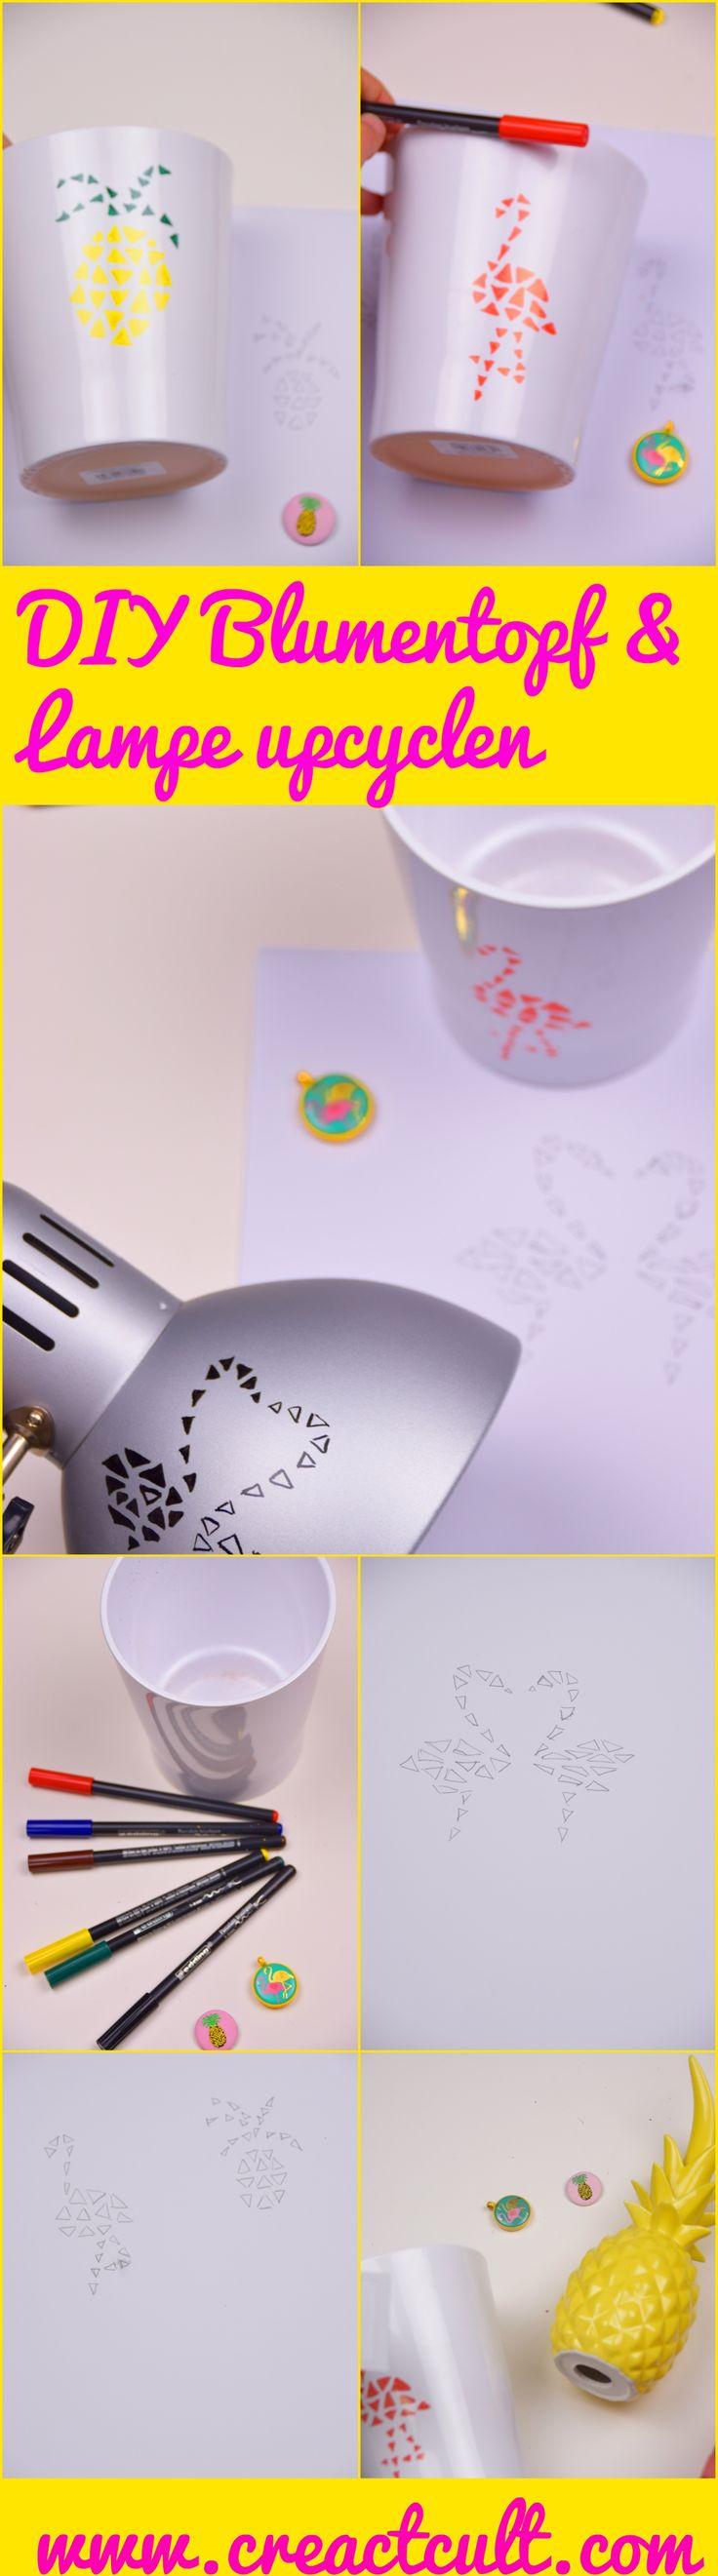 9650f11b004e3fb31f8ef1d93f2c0246--flamingos-oder Spannende Wandlampe Kinderzimmer Selber Basteln Dekorationen